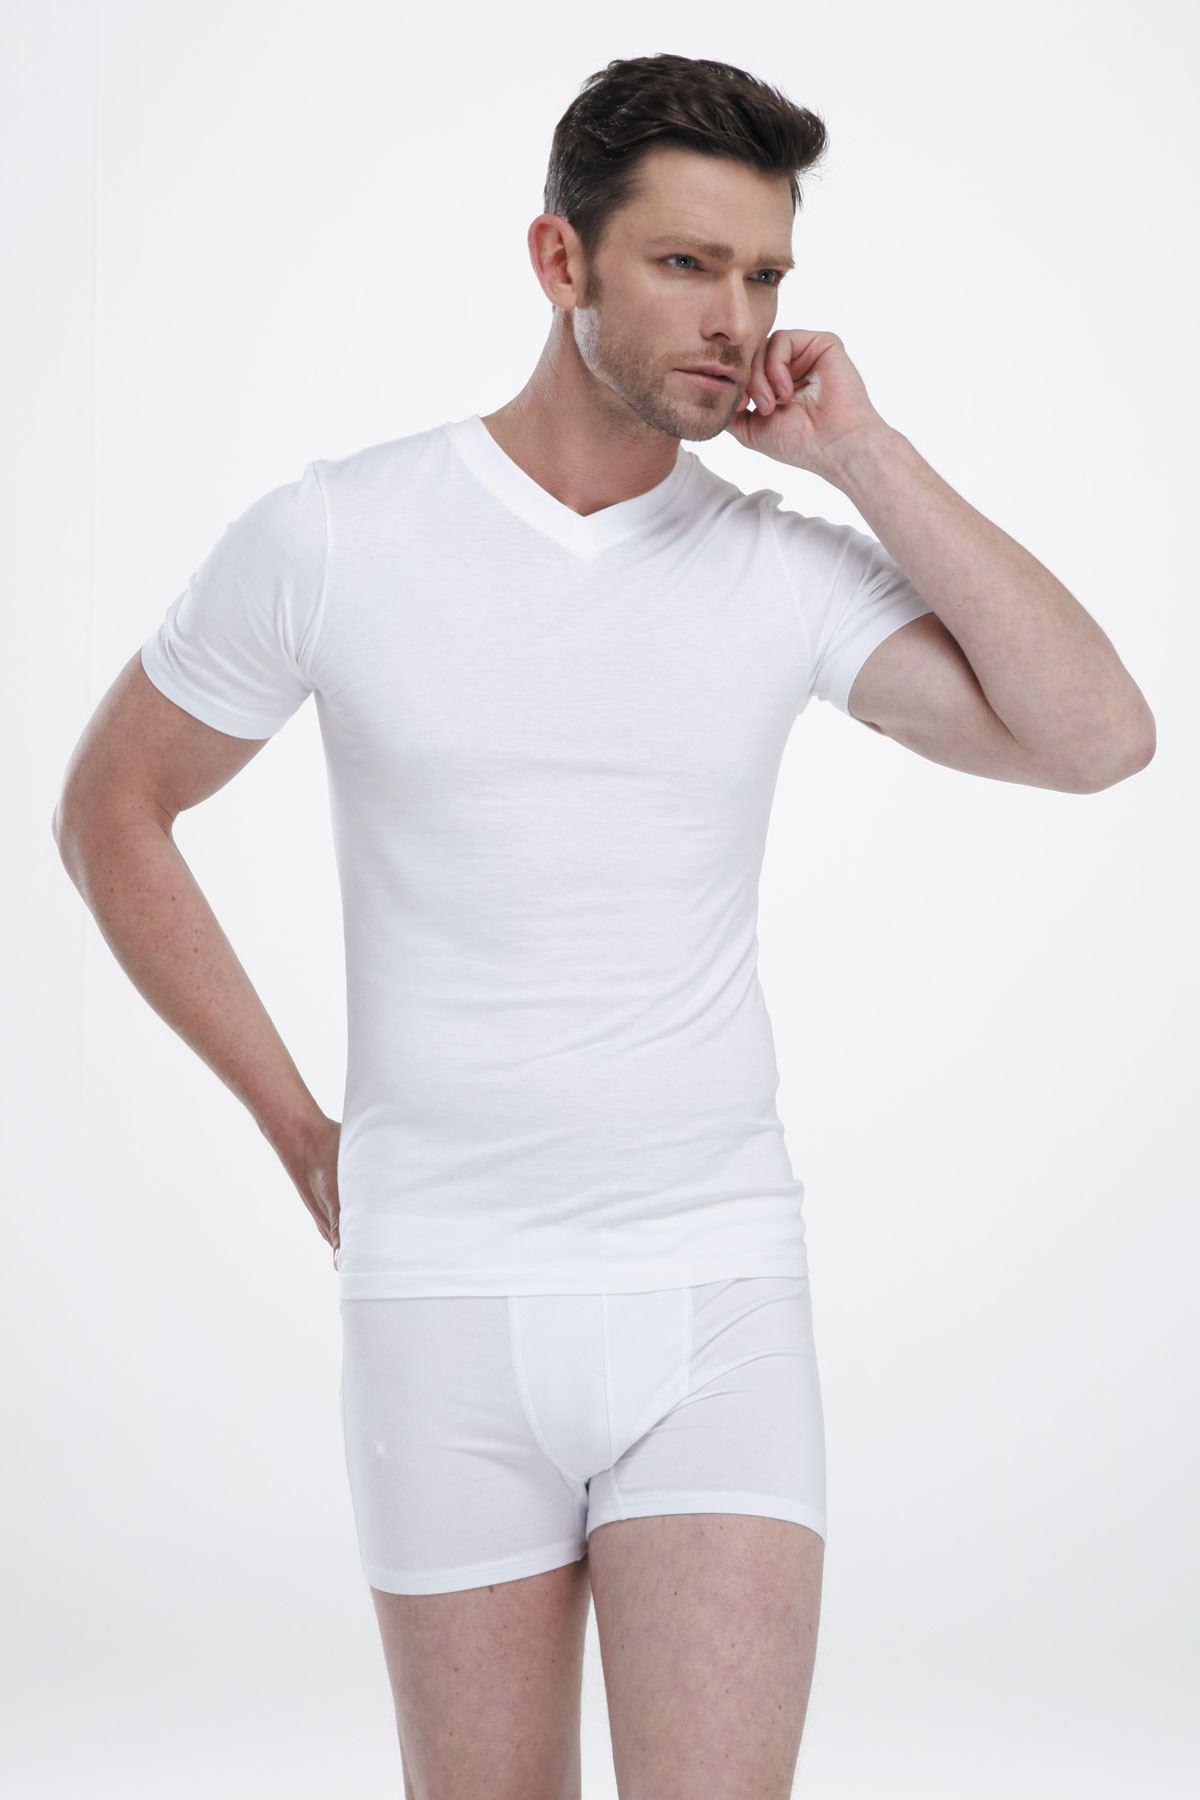 Beyaz Erkek V Yaka Kısa Kol Süprem Fanila Cotton 005